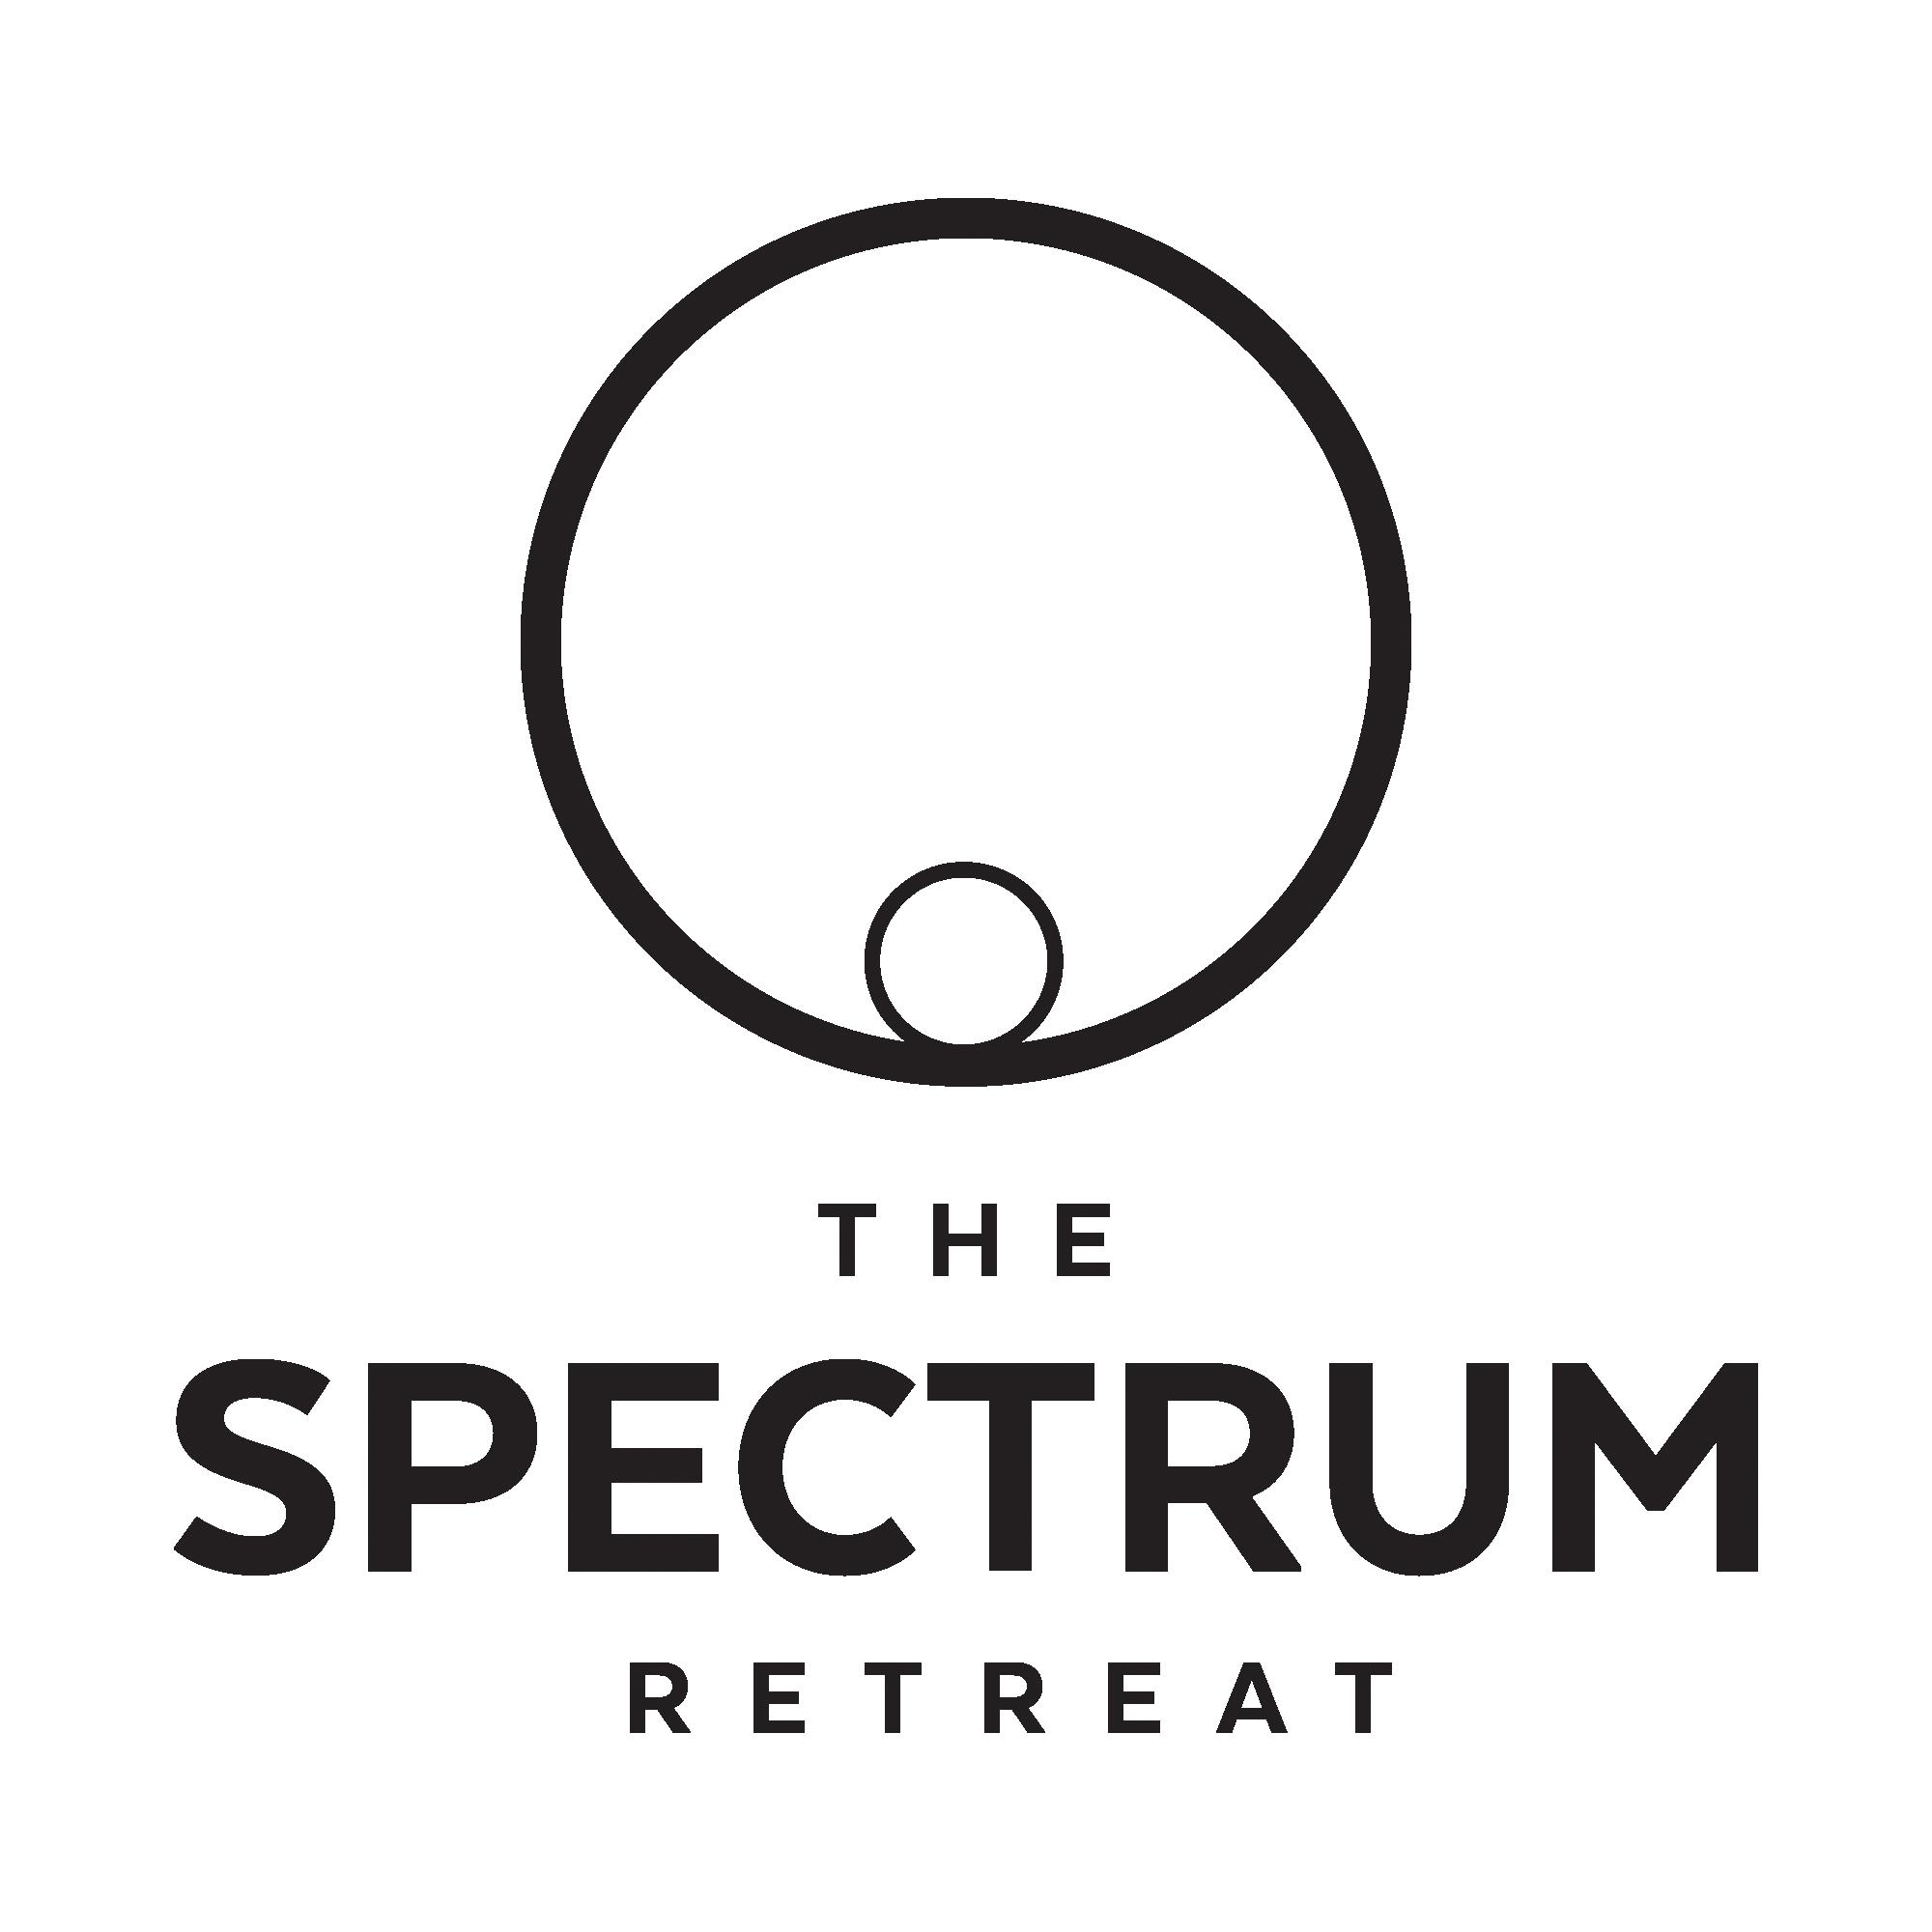 the_spectrum_retreat.png